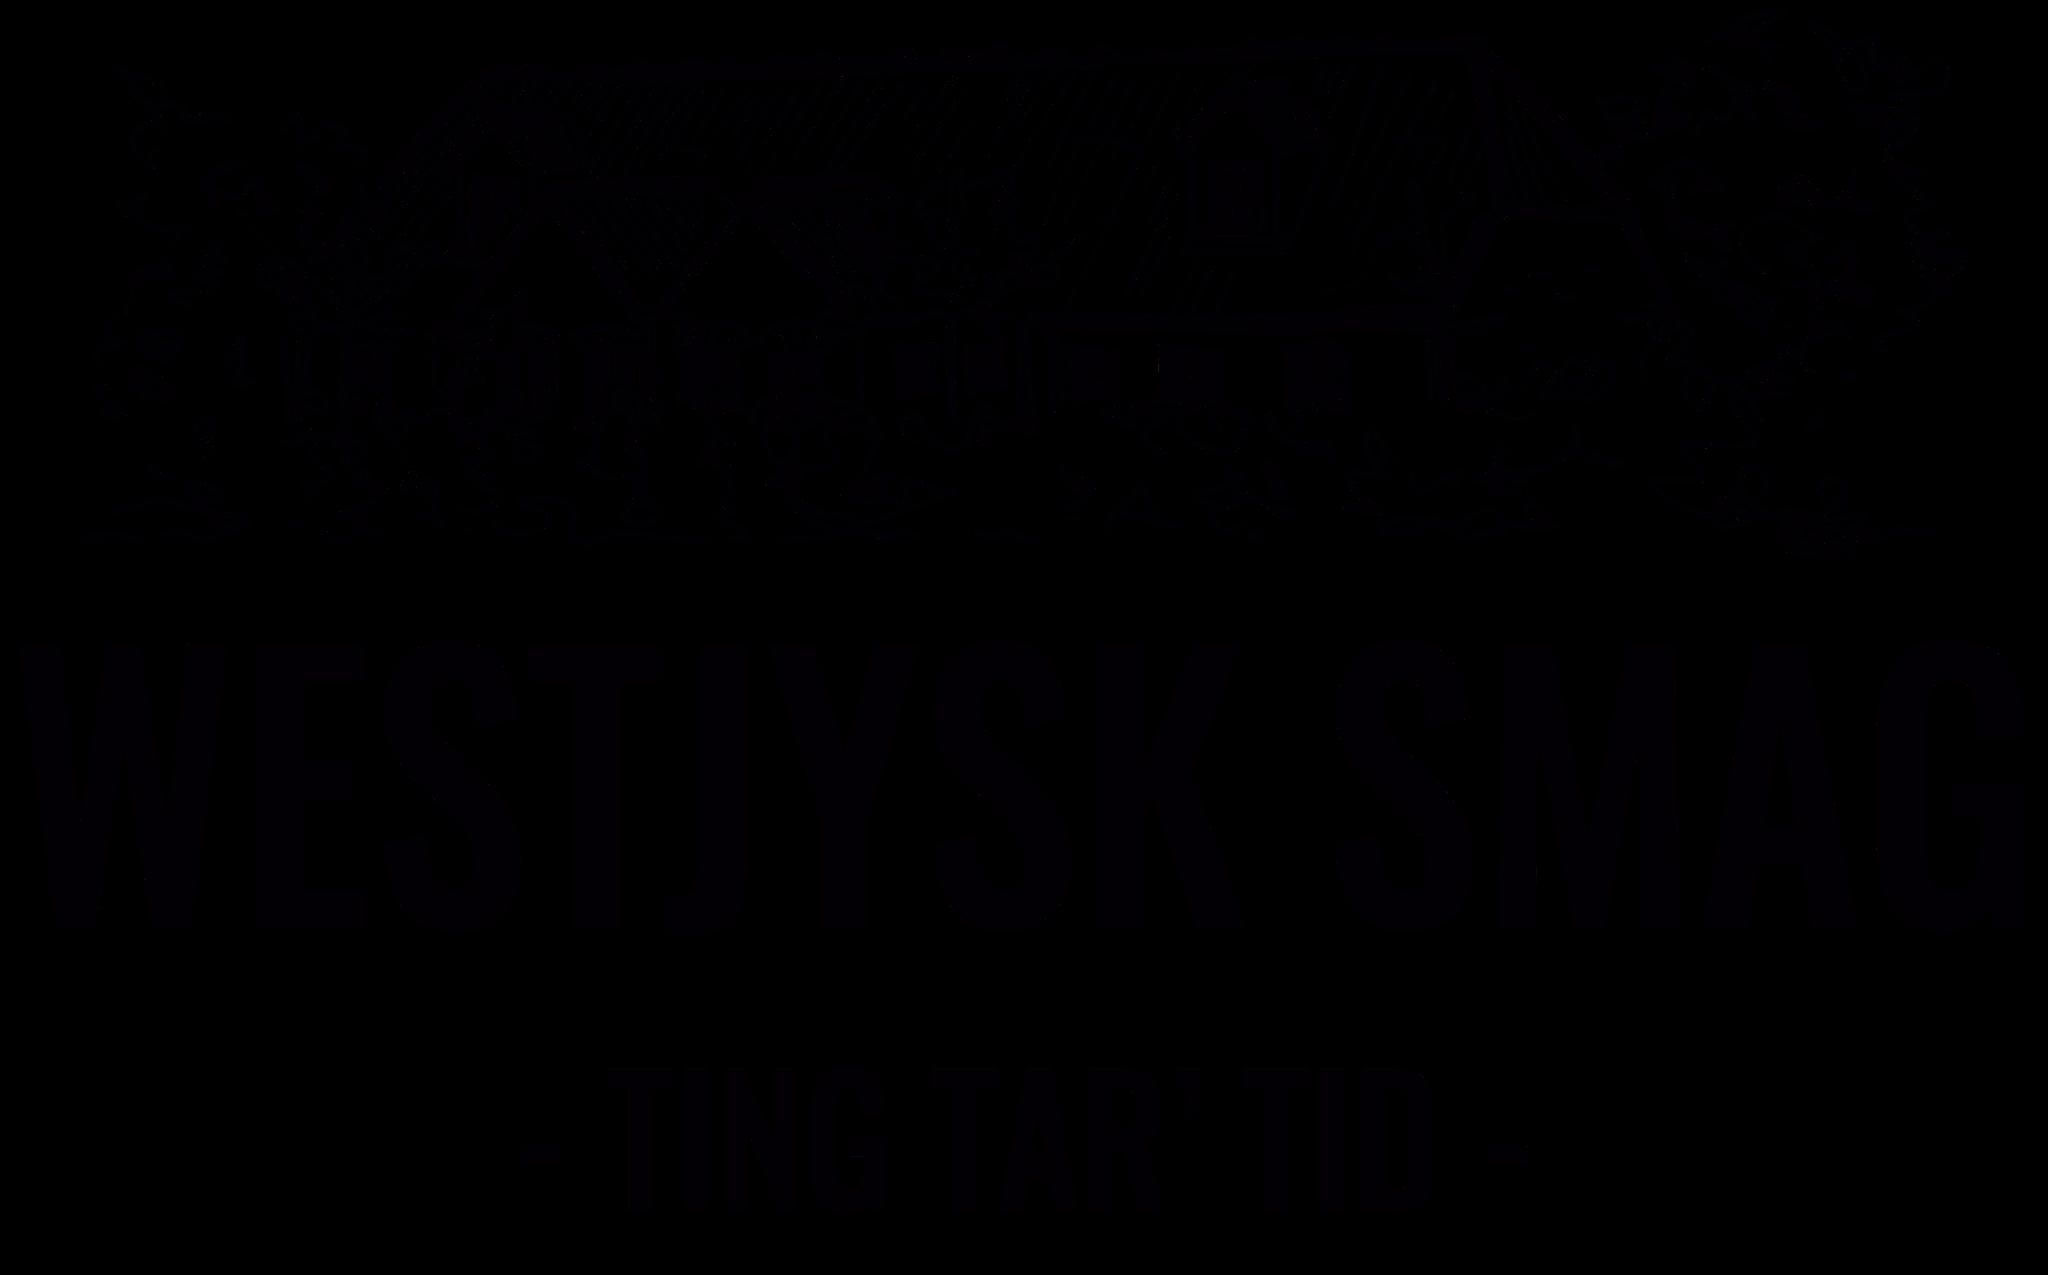 Westjysk Smag – Ting tar' tid